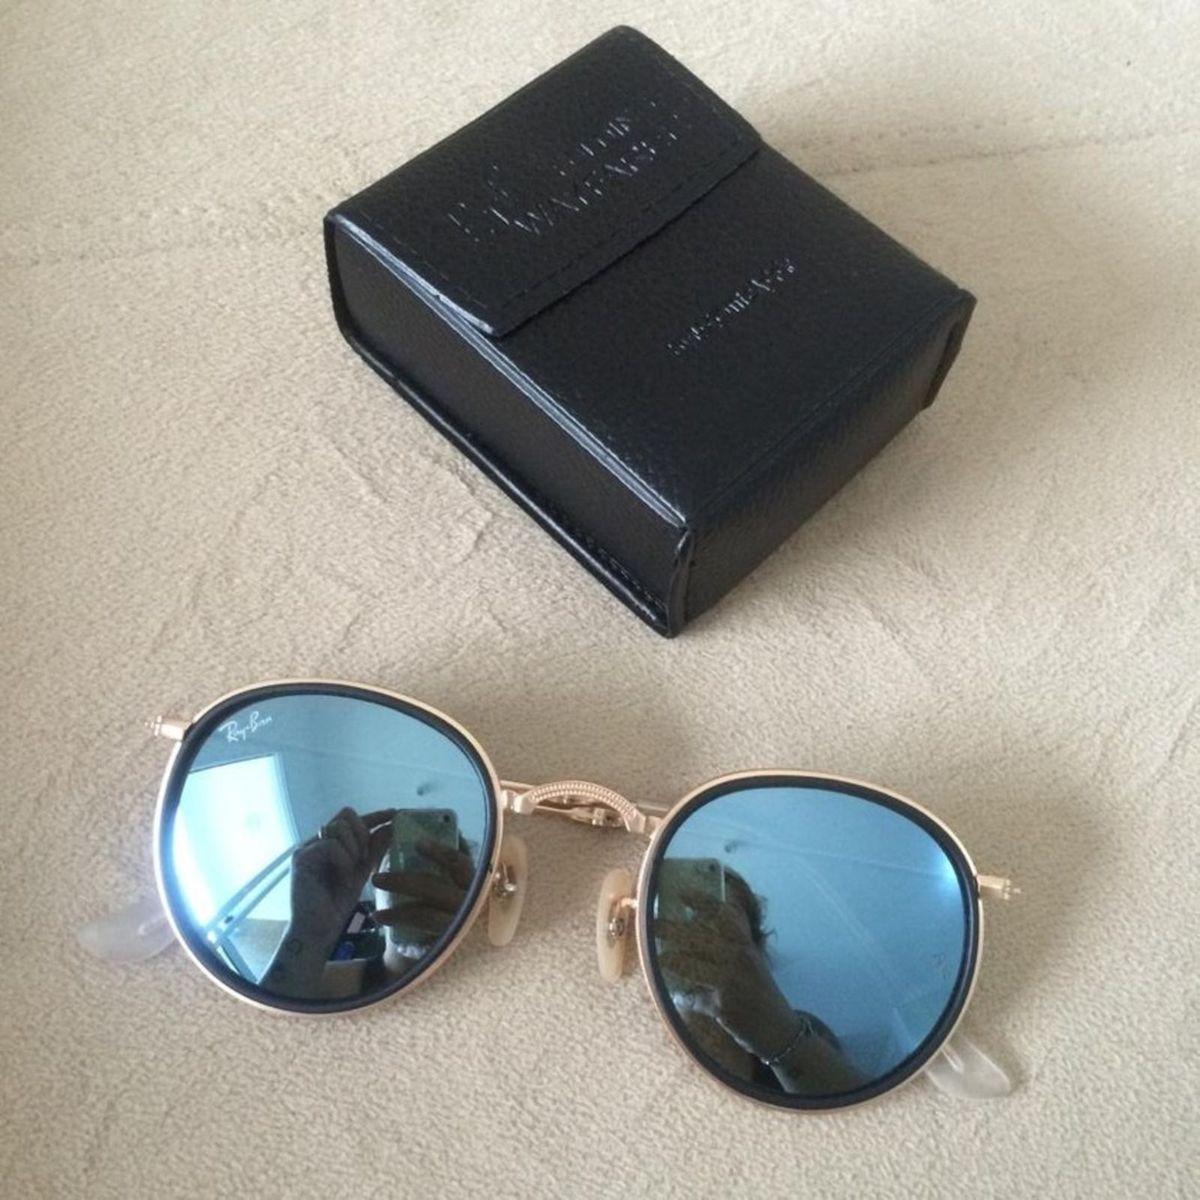 482862642f8f2 ray ban round azul dobrável - óculos ray ban.  Czm6ly9wag90b3muzw5qb2vplmnvbs5ici9wcm9kdwn0cy80nja5mtuxl2rmngvmnjhkmju2m2zkzdhkmjk1otljzty2ngu4nznmlmpwzw  ...